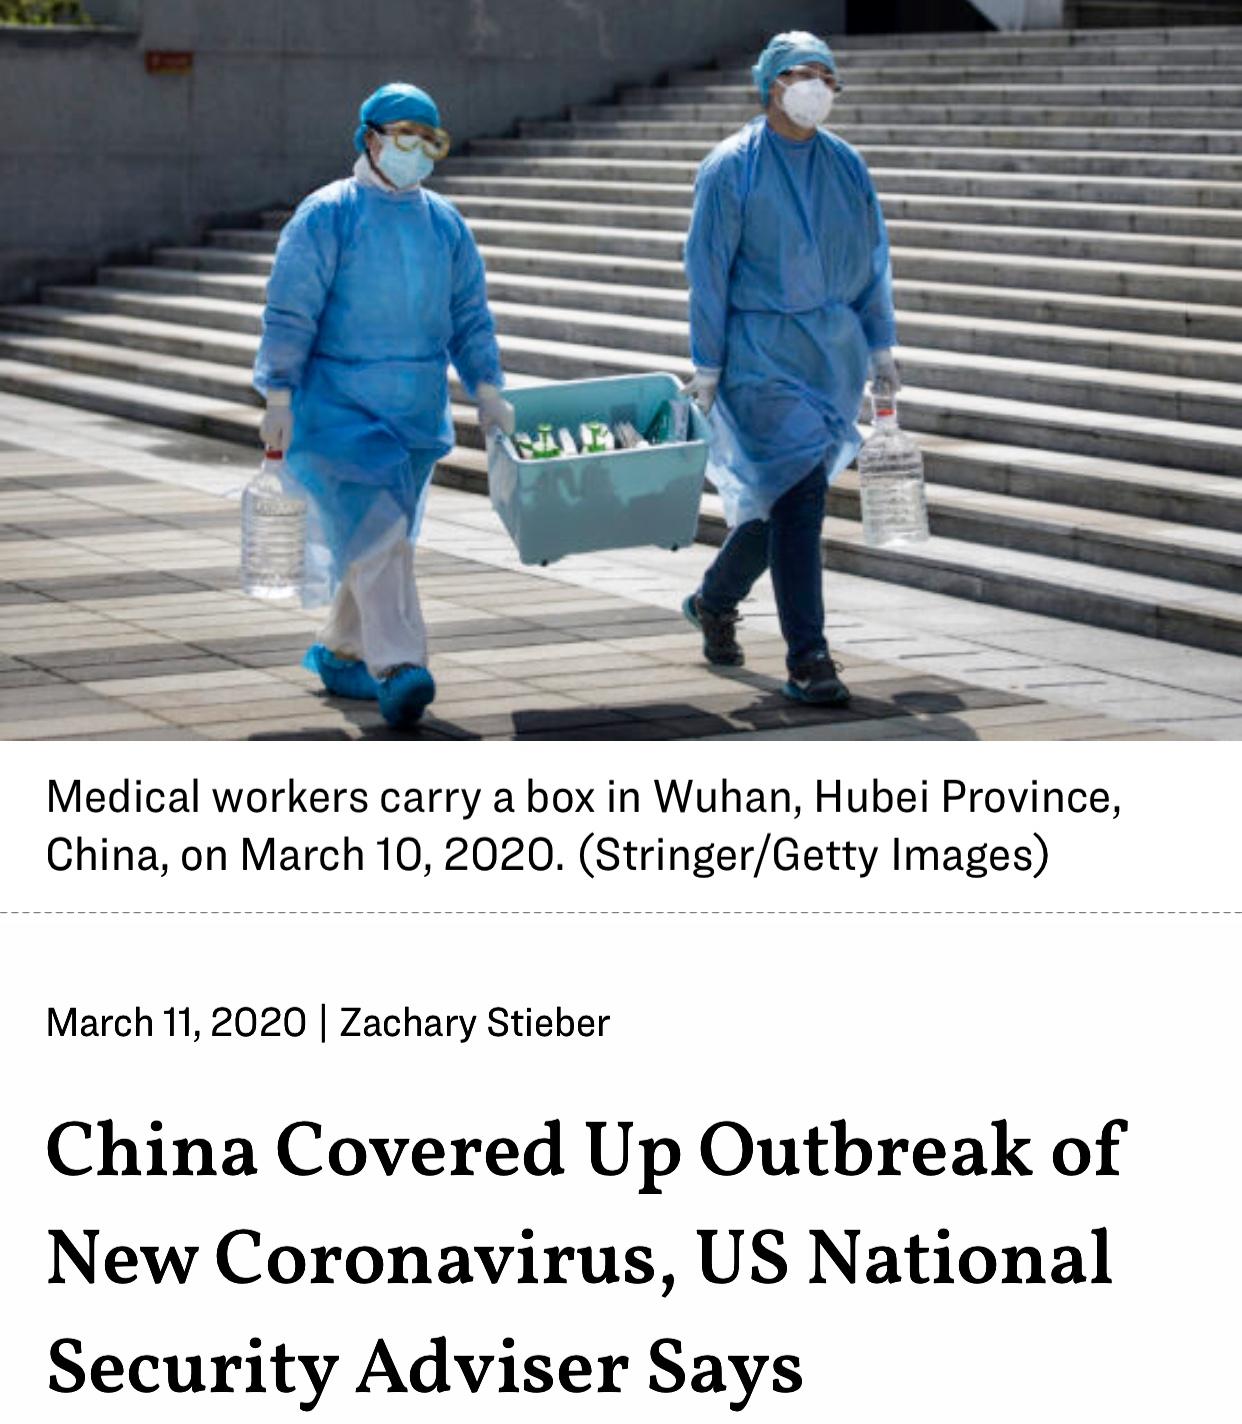 US National Security Adviser Says China Covered Up Outbreak of Coronavirus